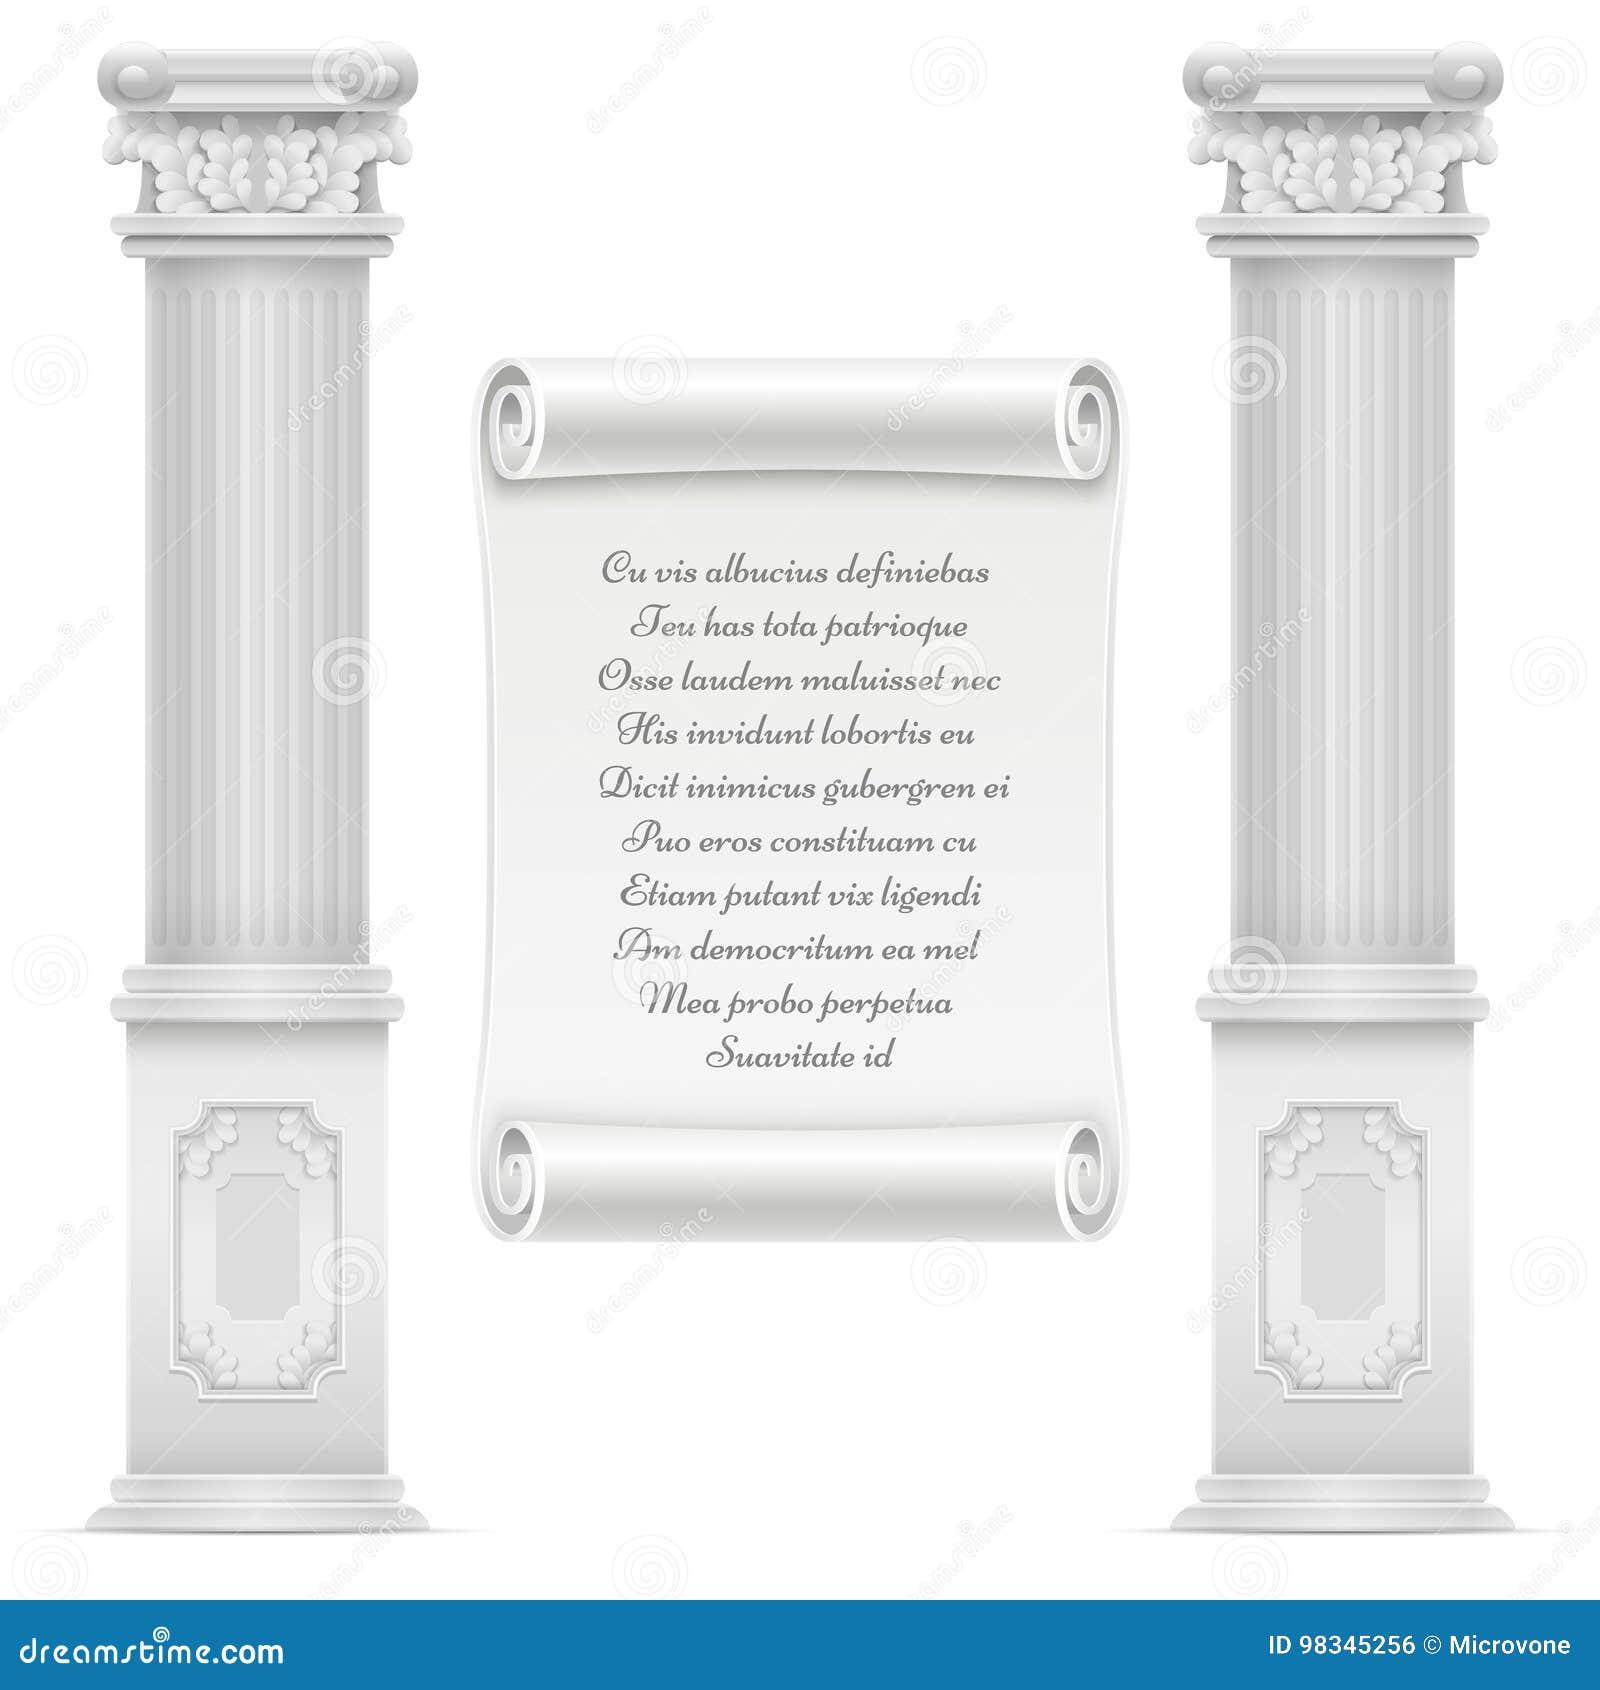 Tekst Op Muur.Antiek Roman Architectuurontwerp Met Marmeren Steen Colomns En Tekst